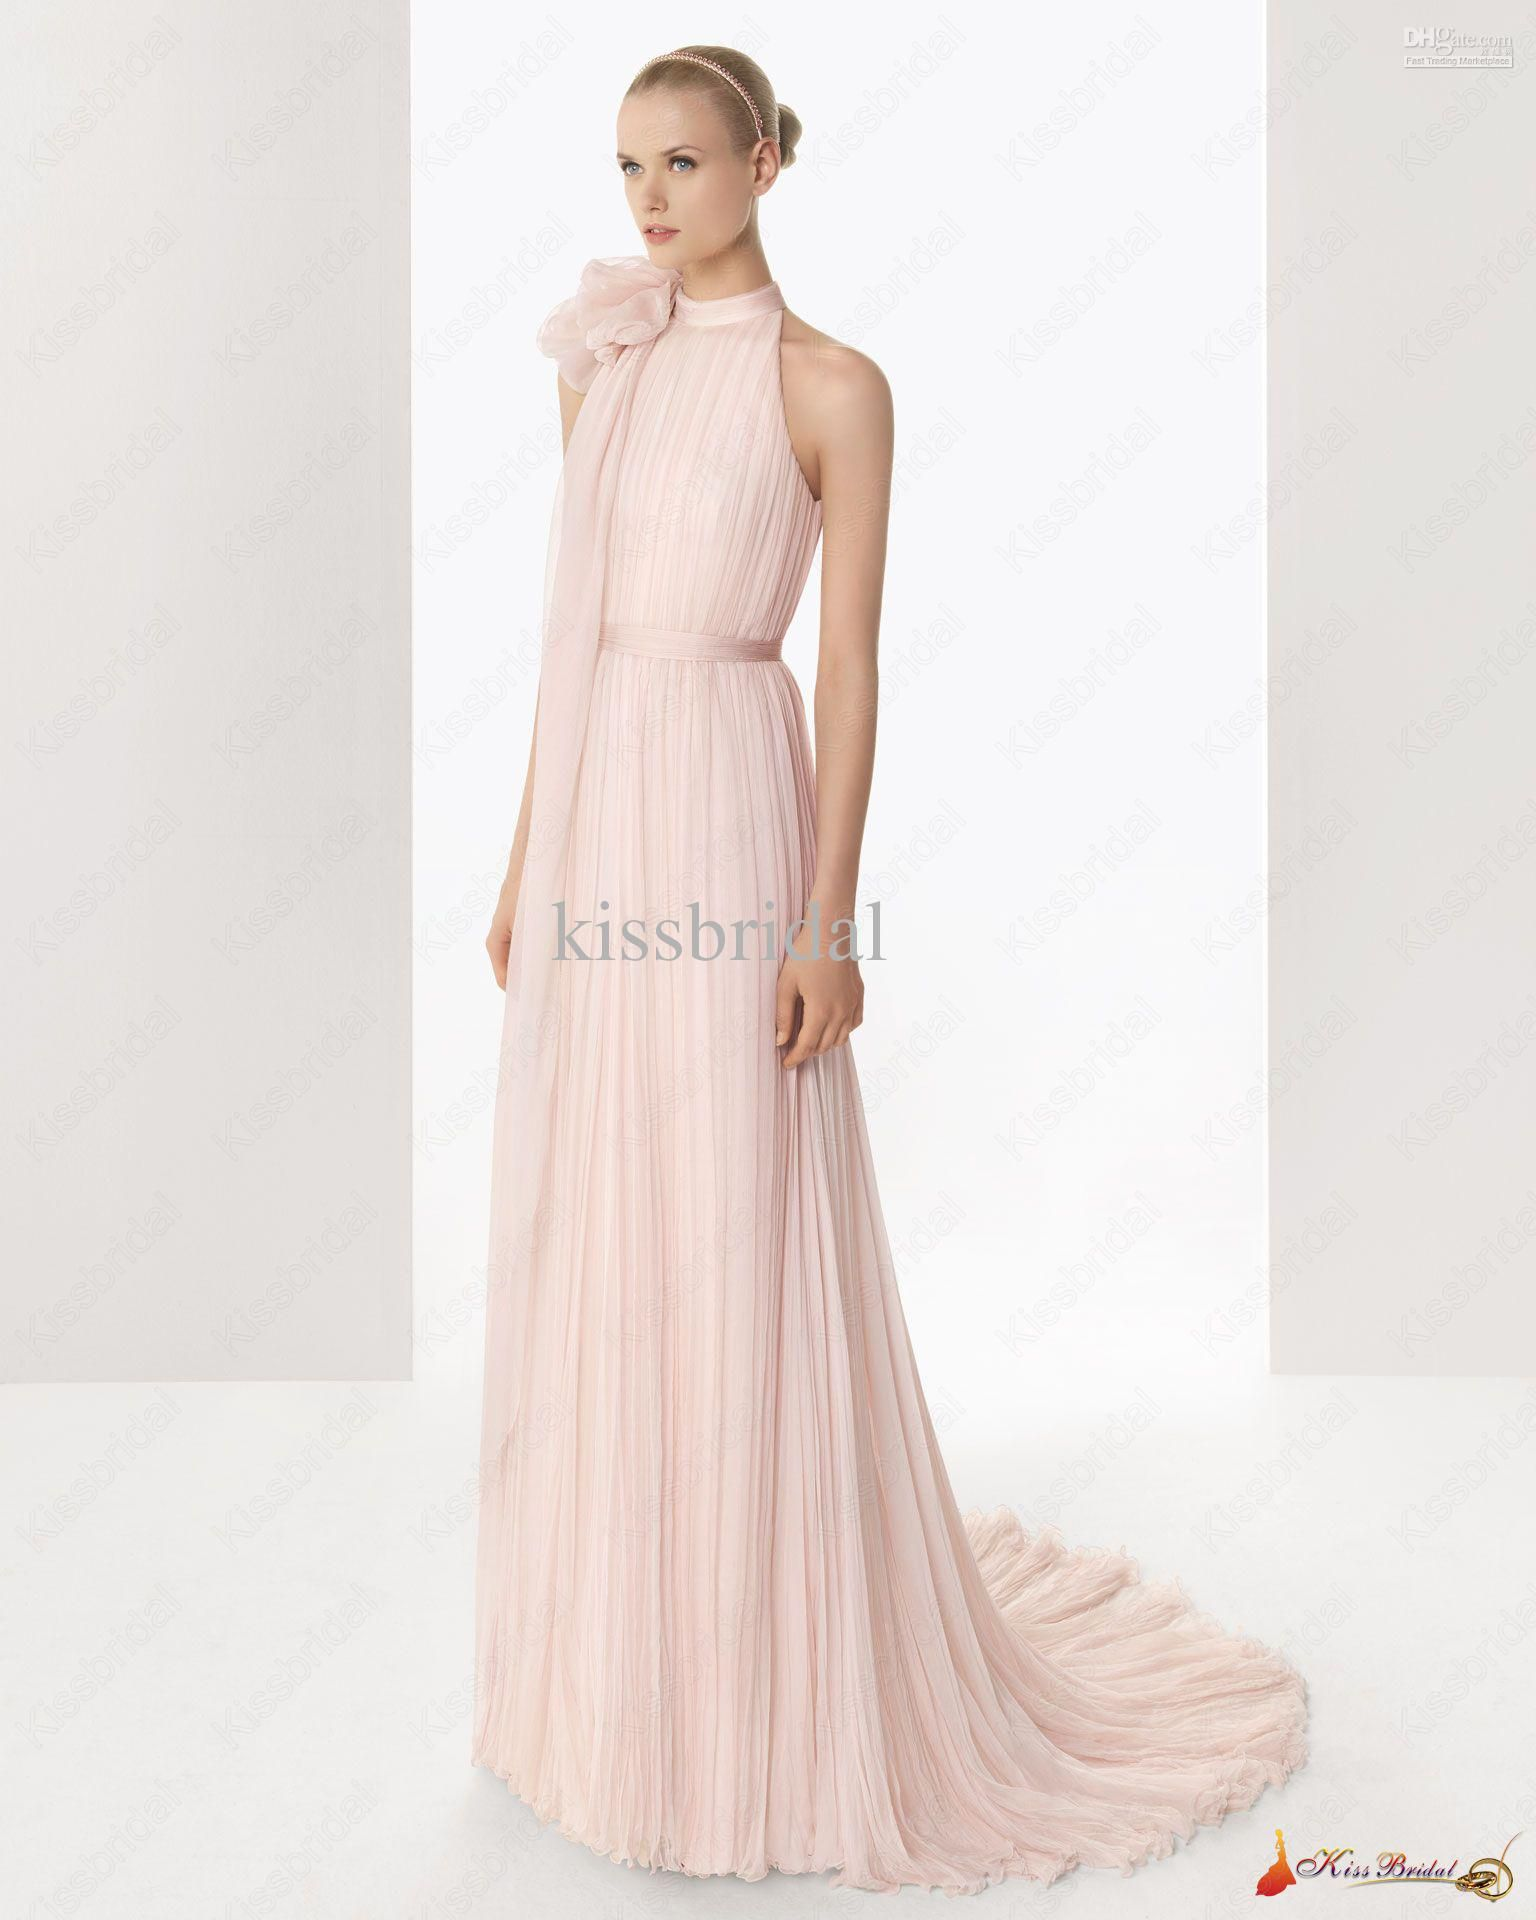 Light Pink Wedding Dresses | Wholesale Hot Style Charming Bridal ...